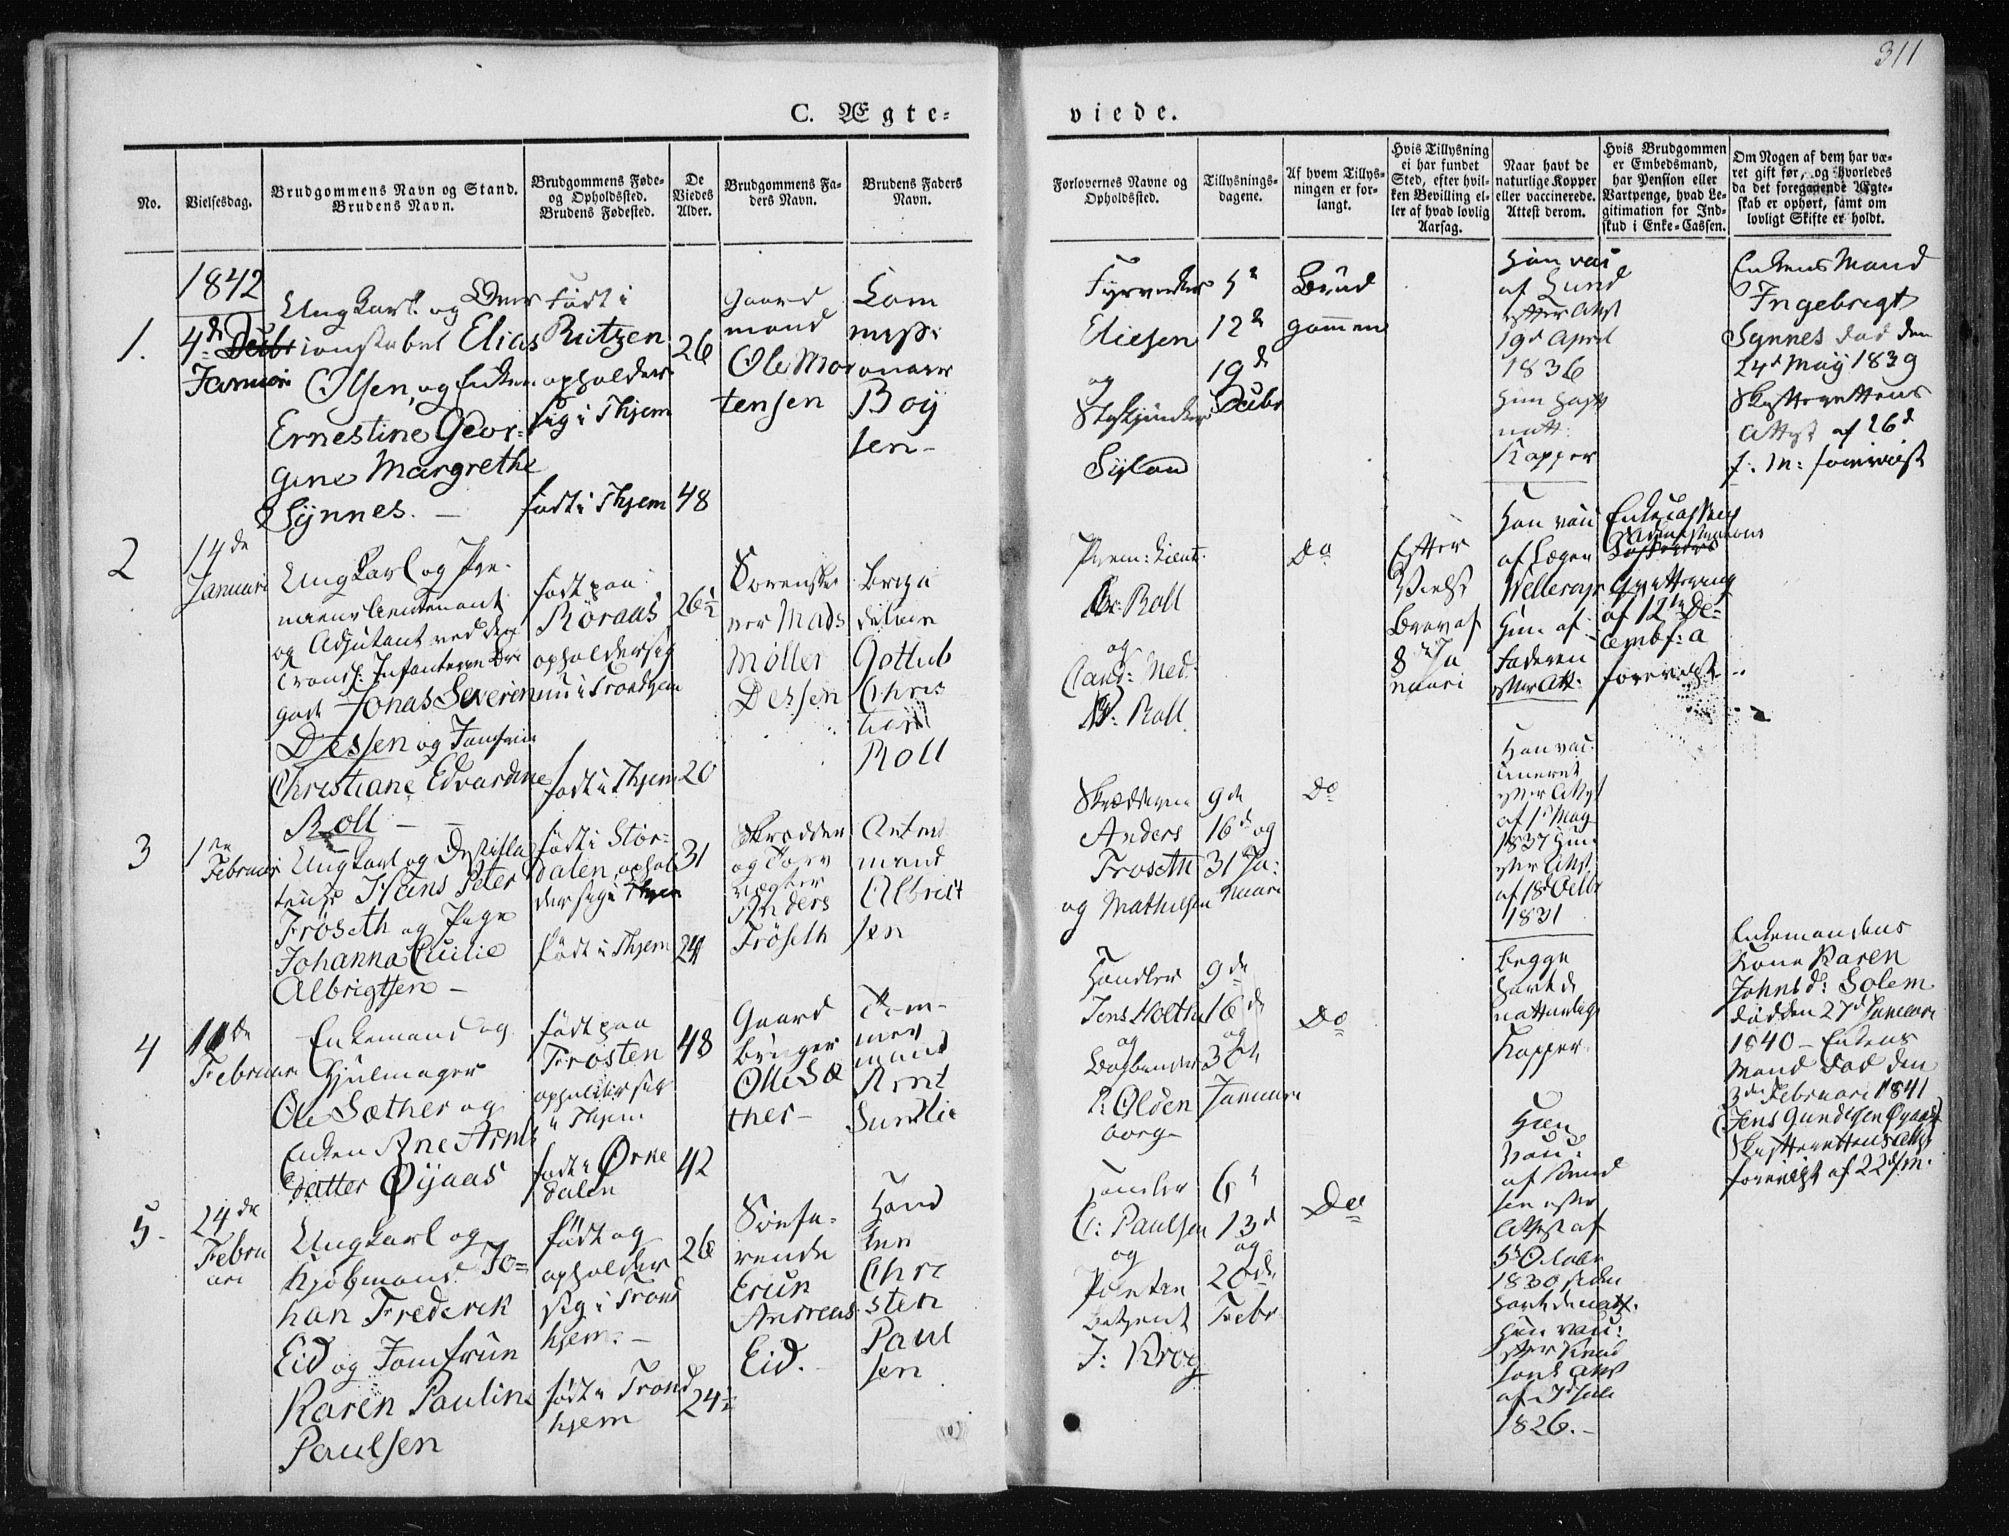 SAT, Ministerialprotokoller, klokkerbøker og fødselsregistre - Sør-Trøndelag, 601/L0049: Parish register (official) no. 601A17, 1839-1847, p. 311